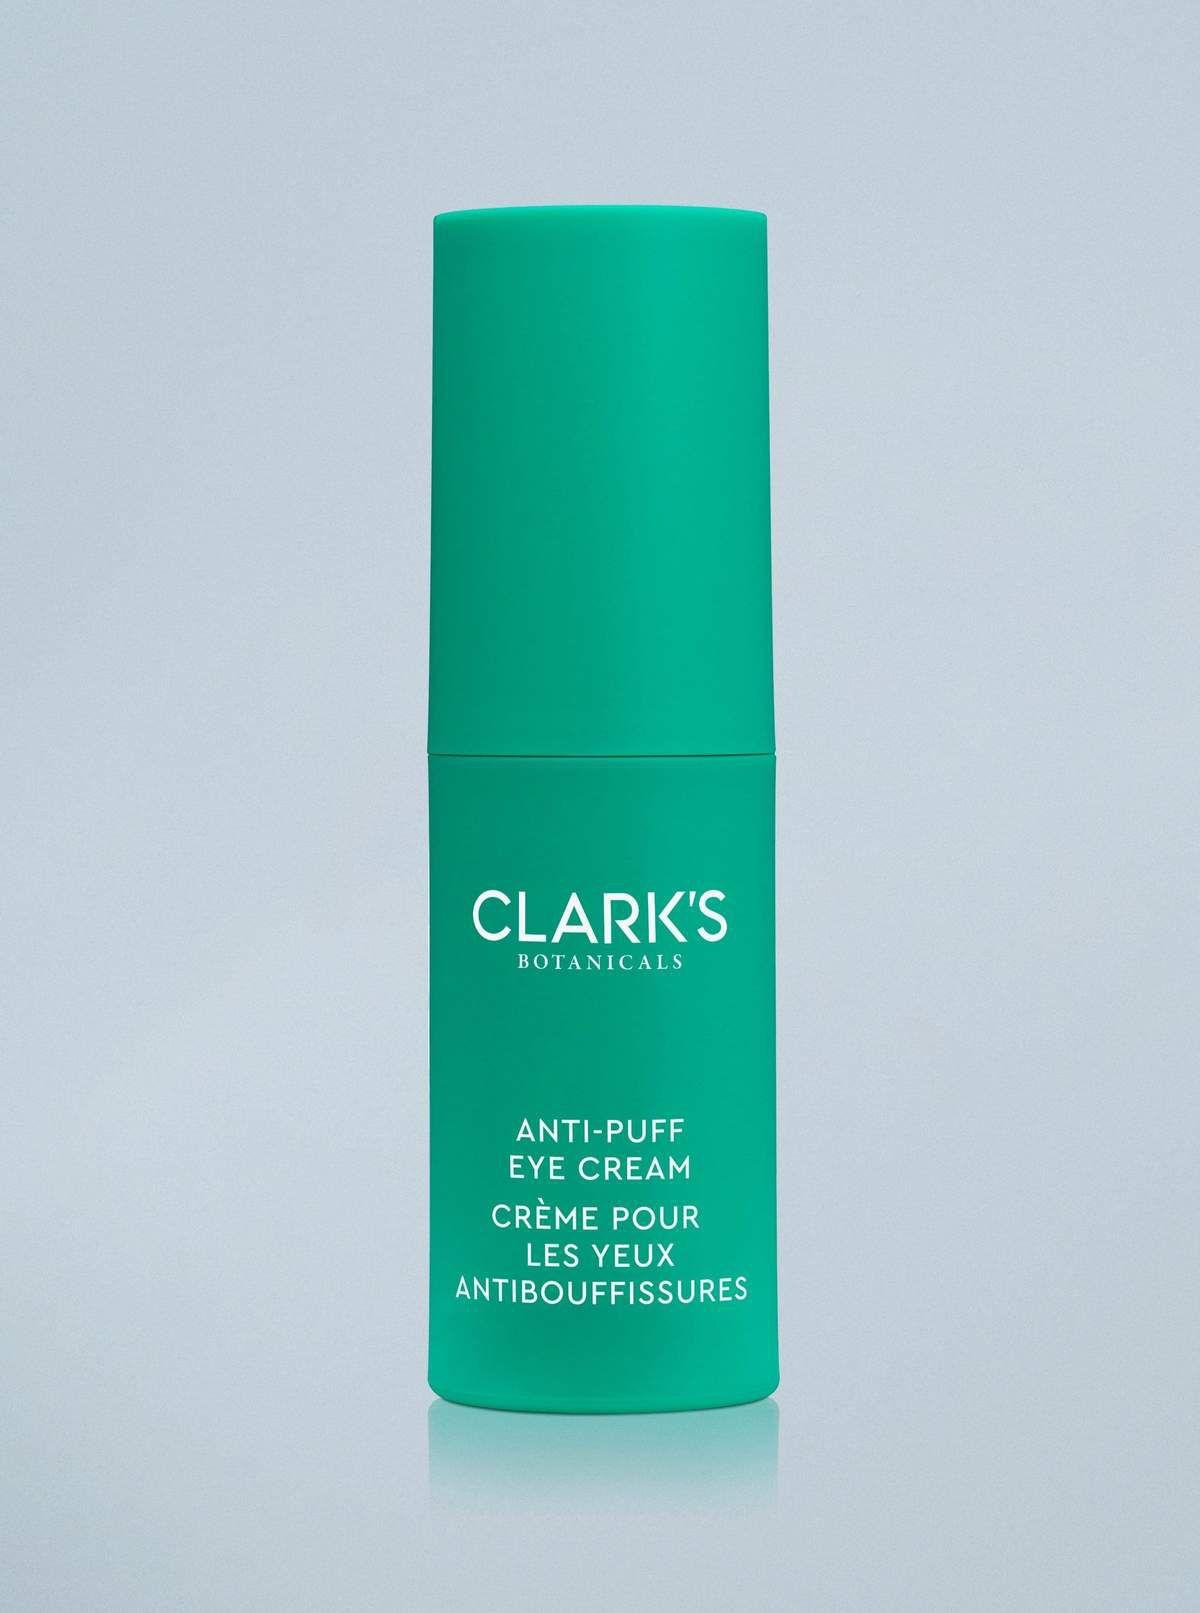 Clark's Botanicals Anti-Puff Eye Cream